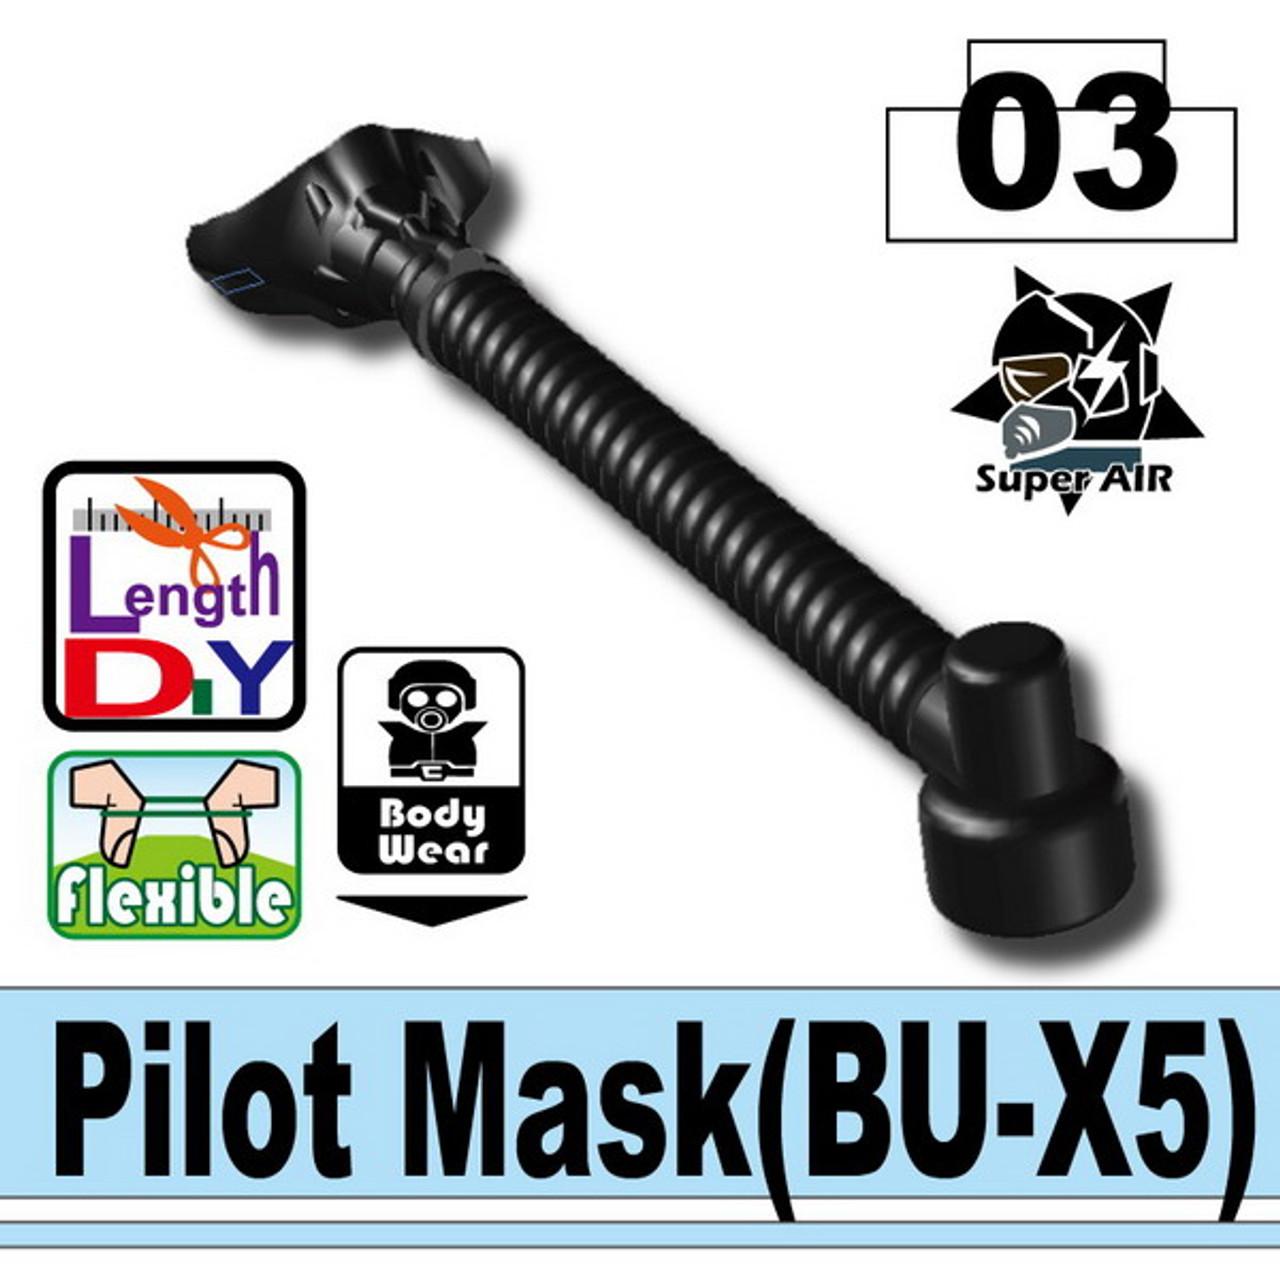 Minifig.Cat Pilot Mask (BU-X5)